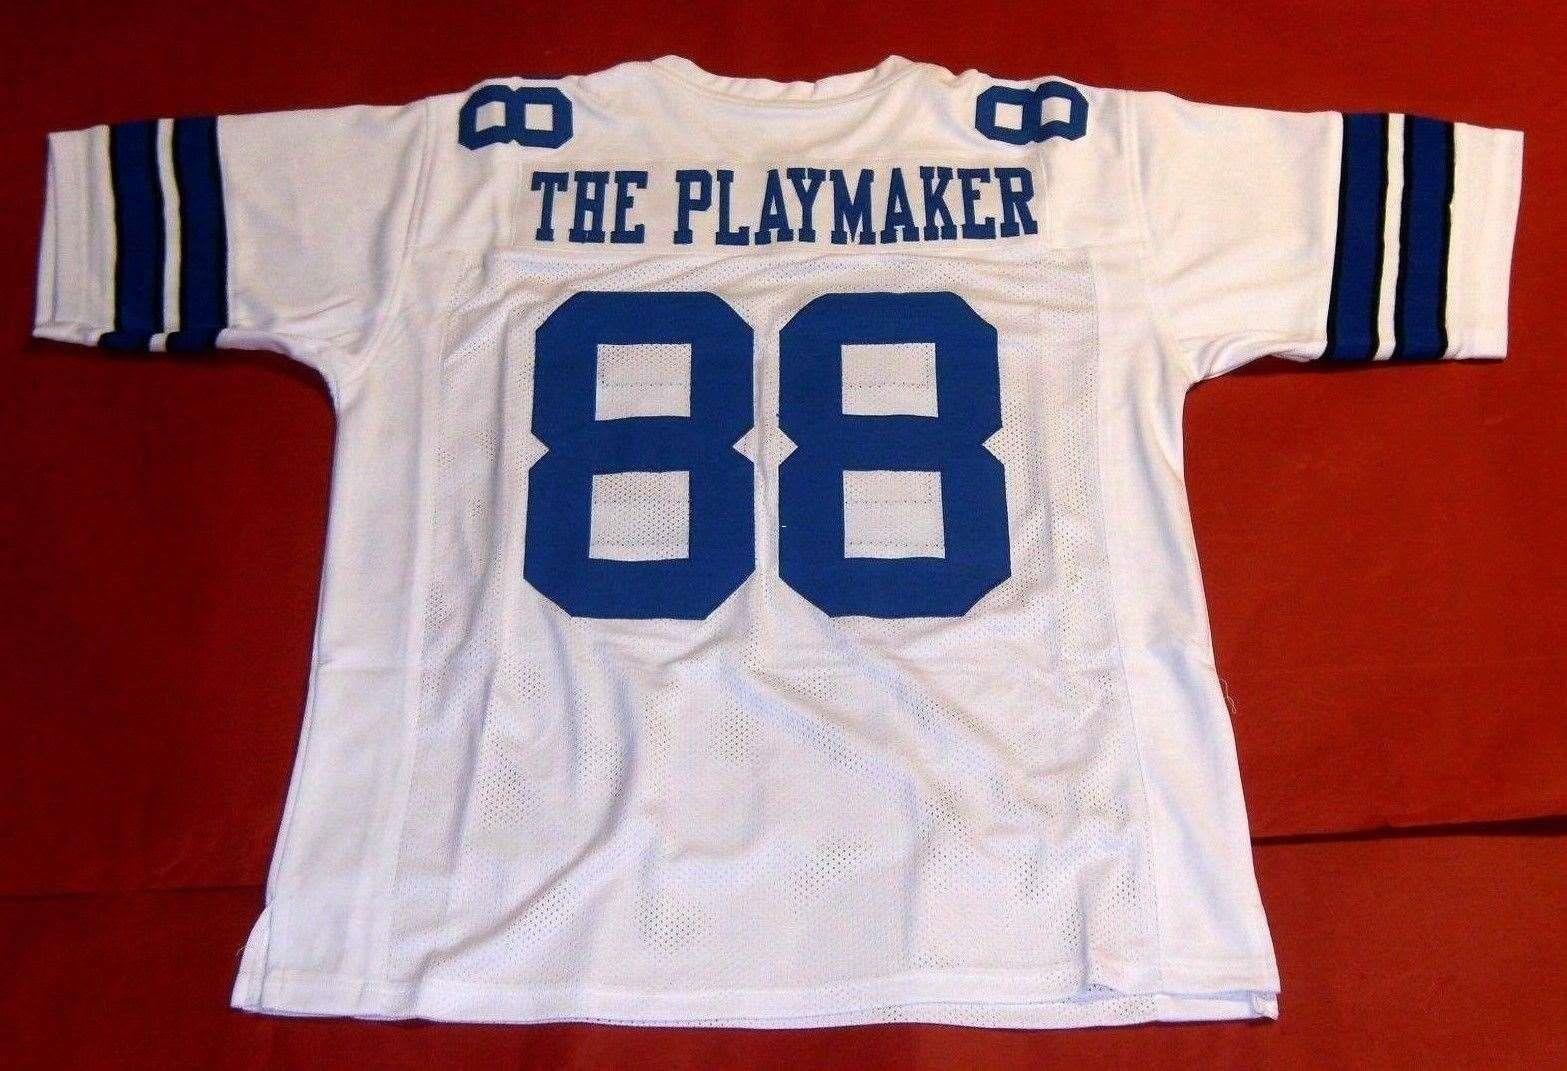 timeless design fdfc5 63d9f Cheap retro #88 MICHAEL IRVIN CUSTOM MITCHELL & NESS Jersey THE PLAYMAKER  white Mens Stitching Top S-5XL,6XL Football Jerseys Running